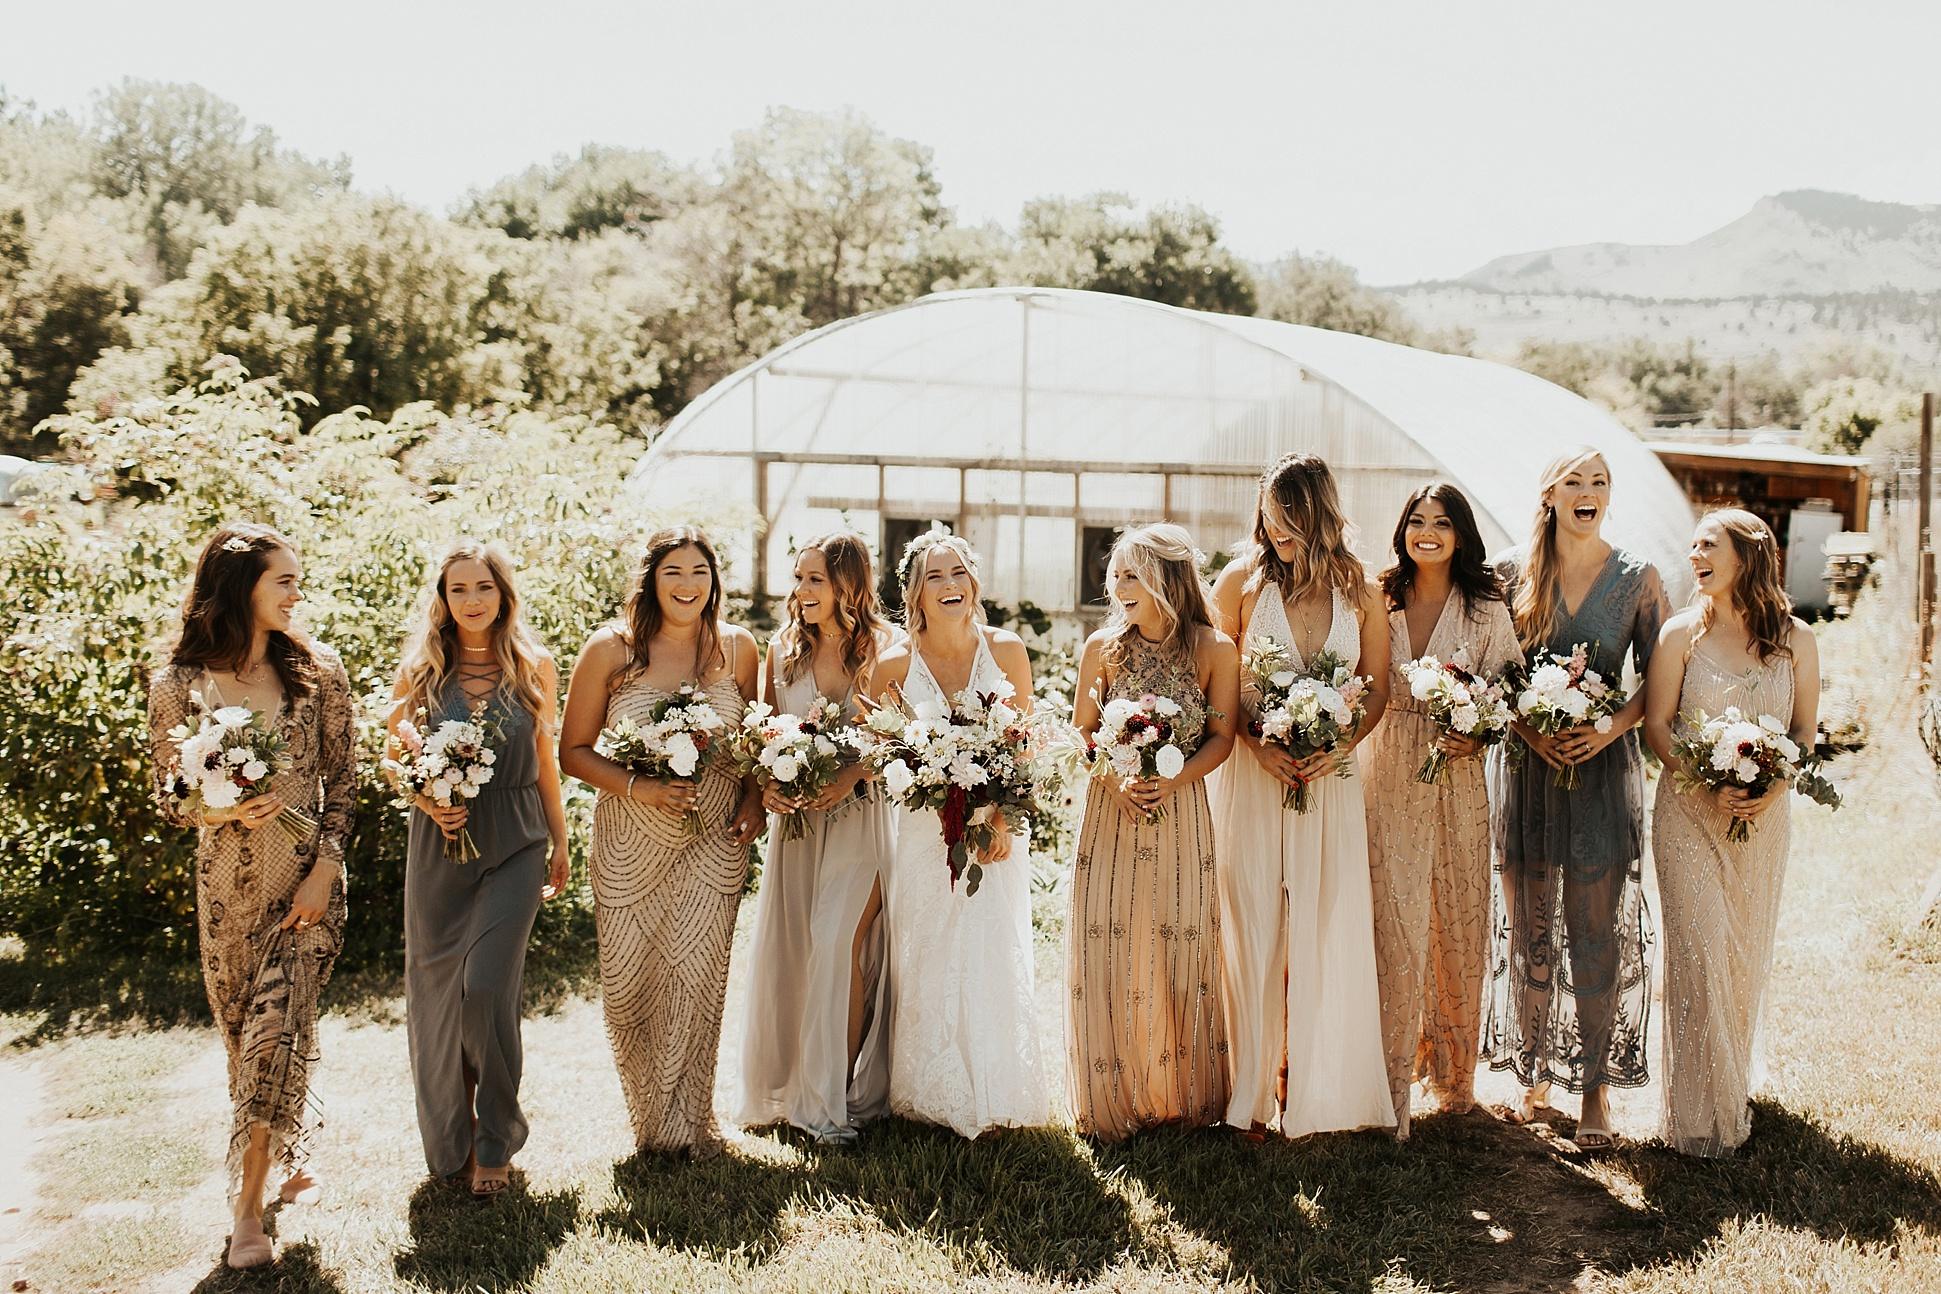 lyons_farmette_colorado_wedding002.JPG